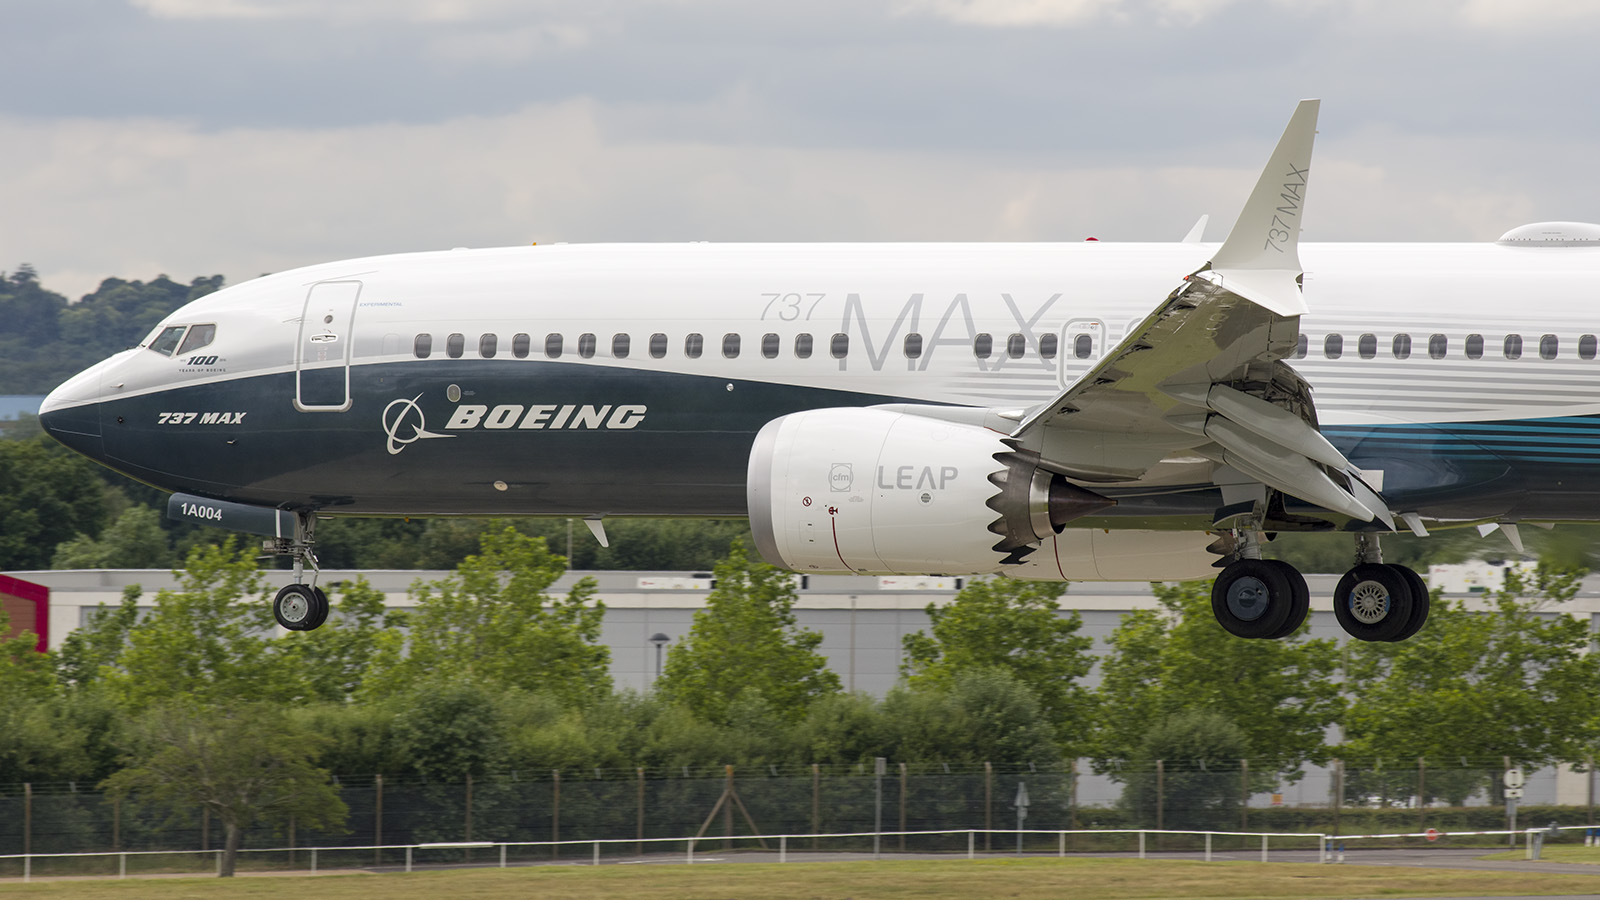 _IMG6015 Boeing 737-8 Max N8704Q Boeing company s